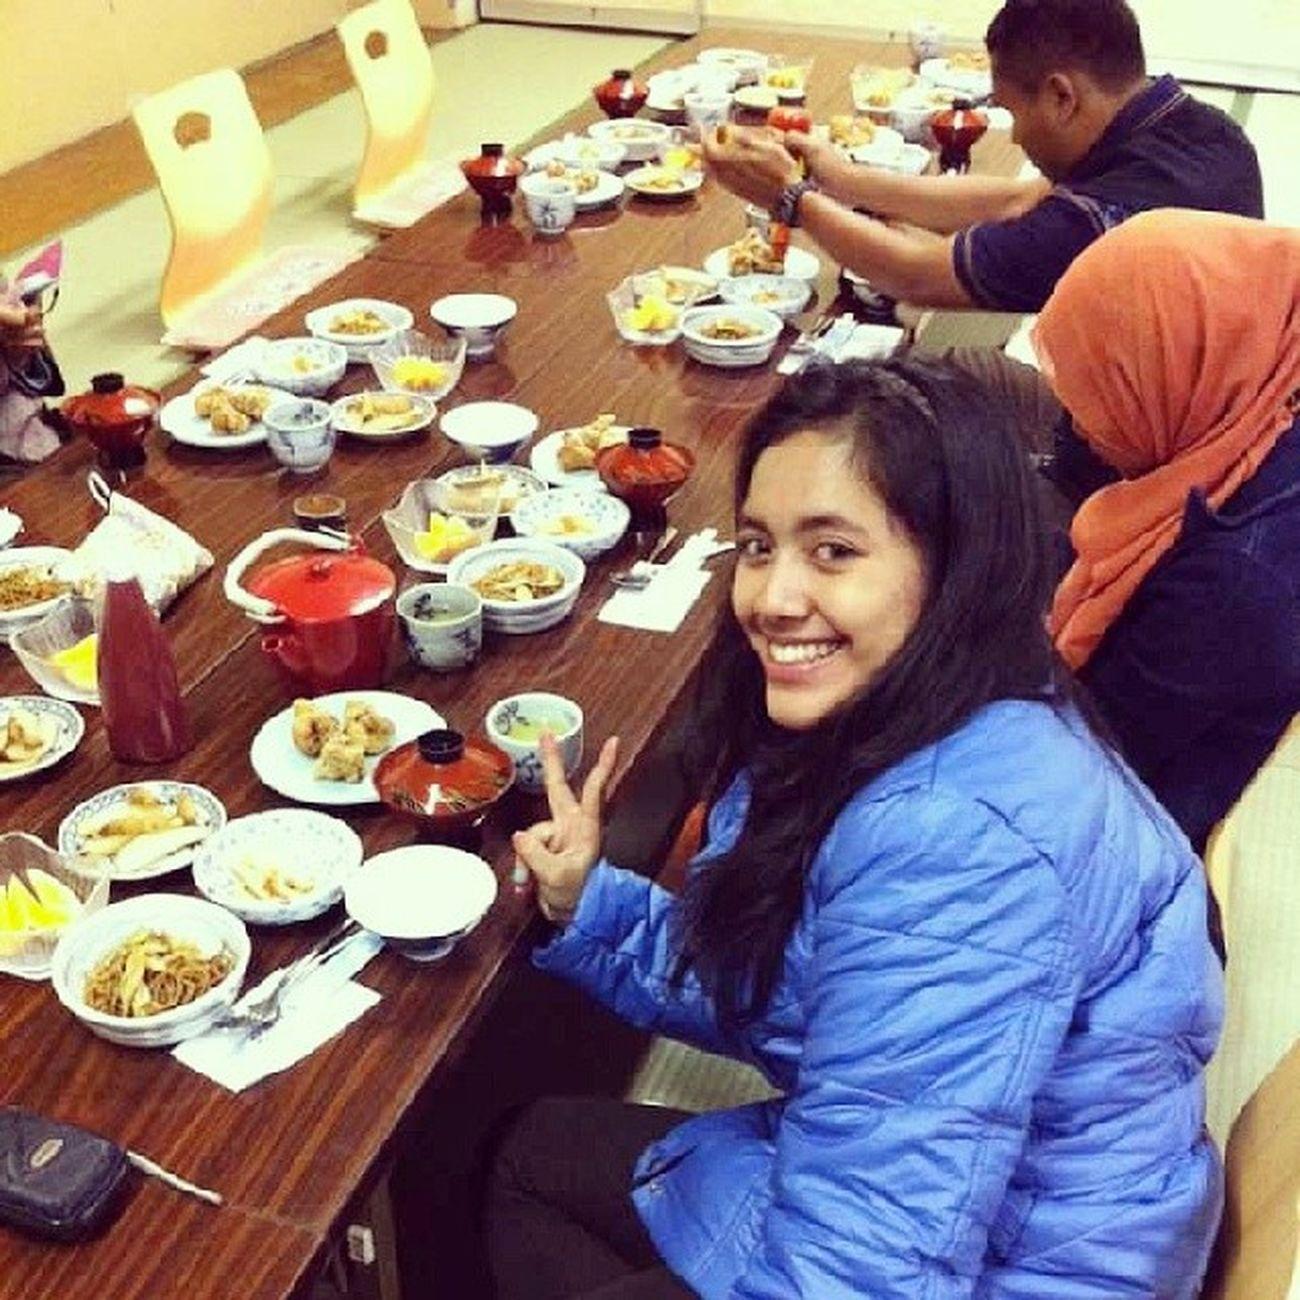 Dinner at ryokan. Routines Ceksuhudulu Throwback Japan chiba kamogawa itadakimasu teamA